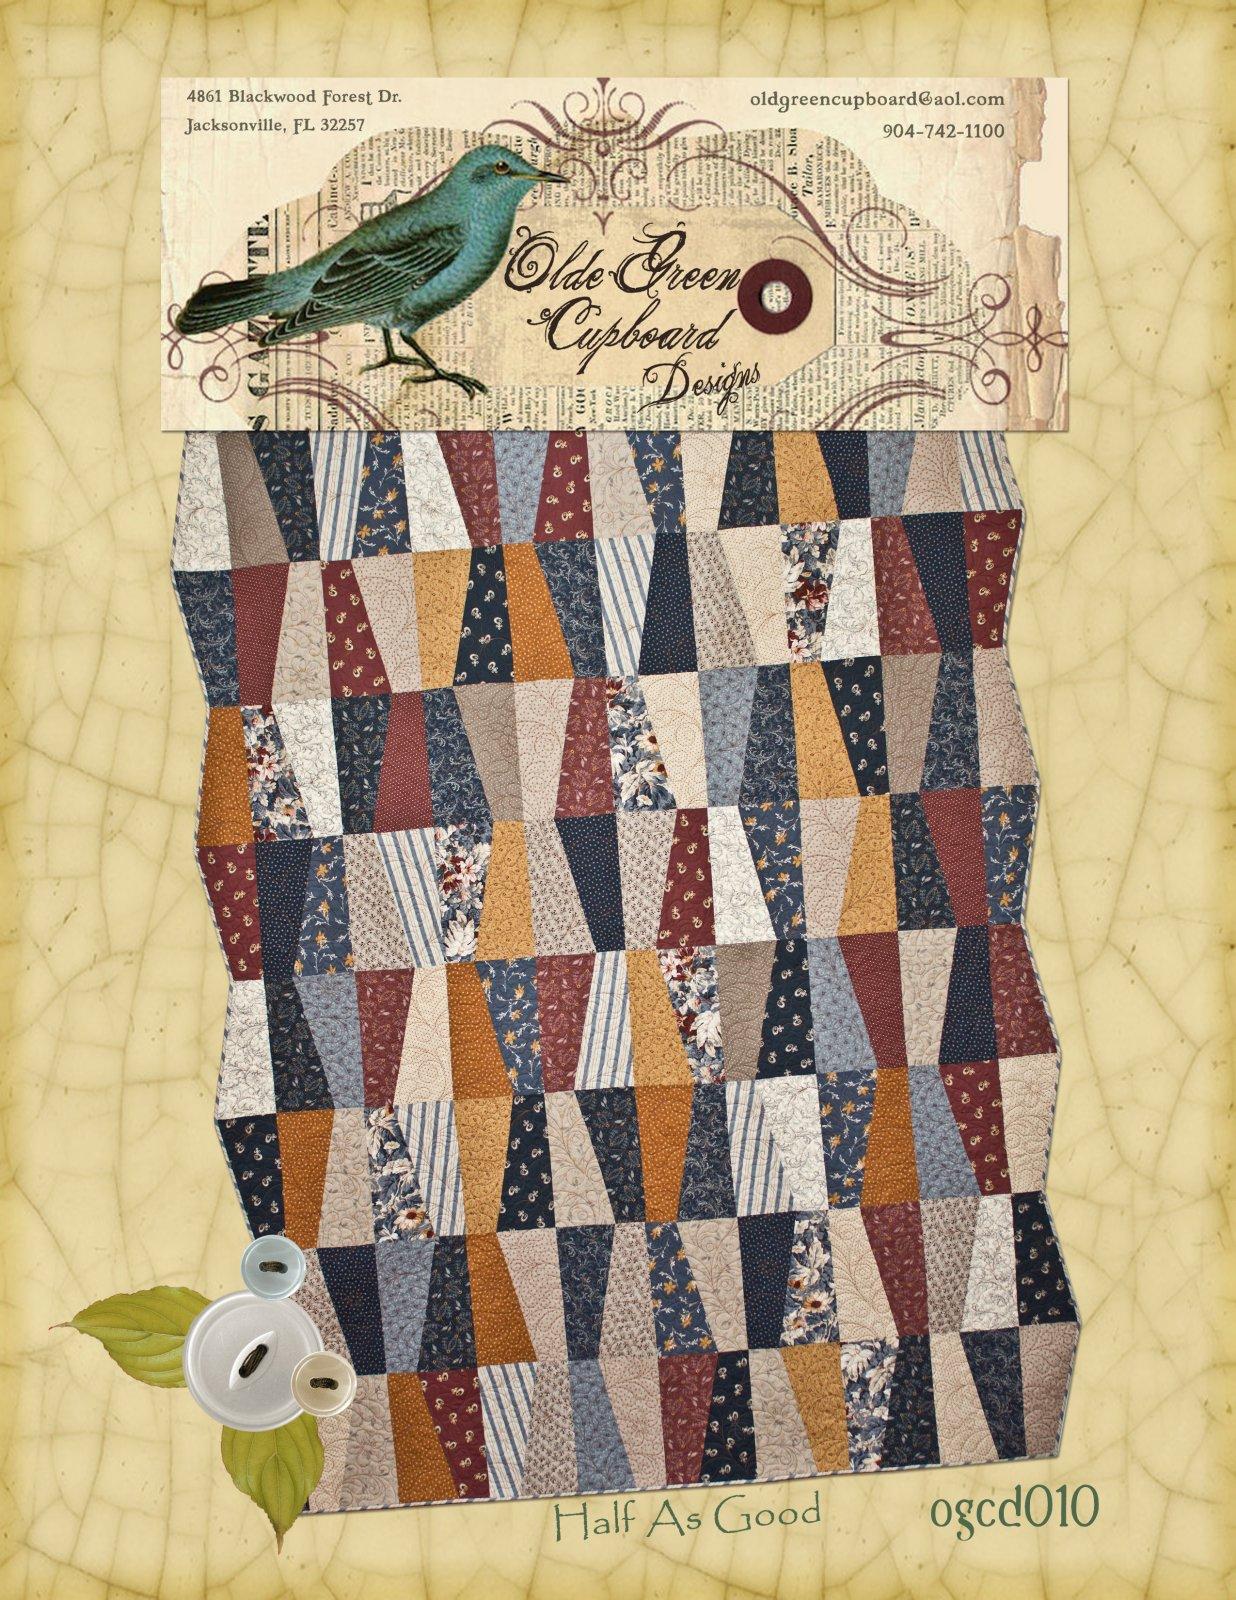 Half As Good Quilt Pattern - OGCD010